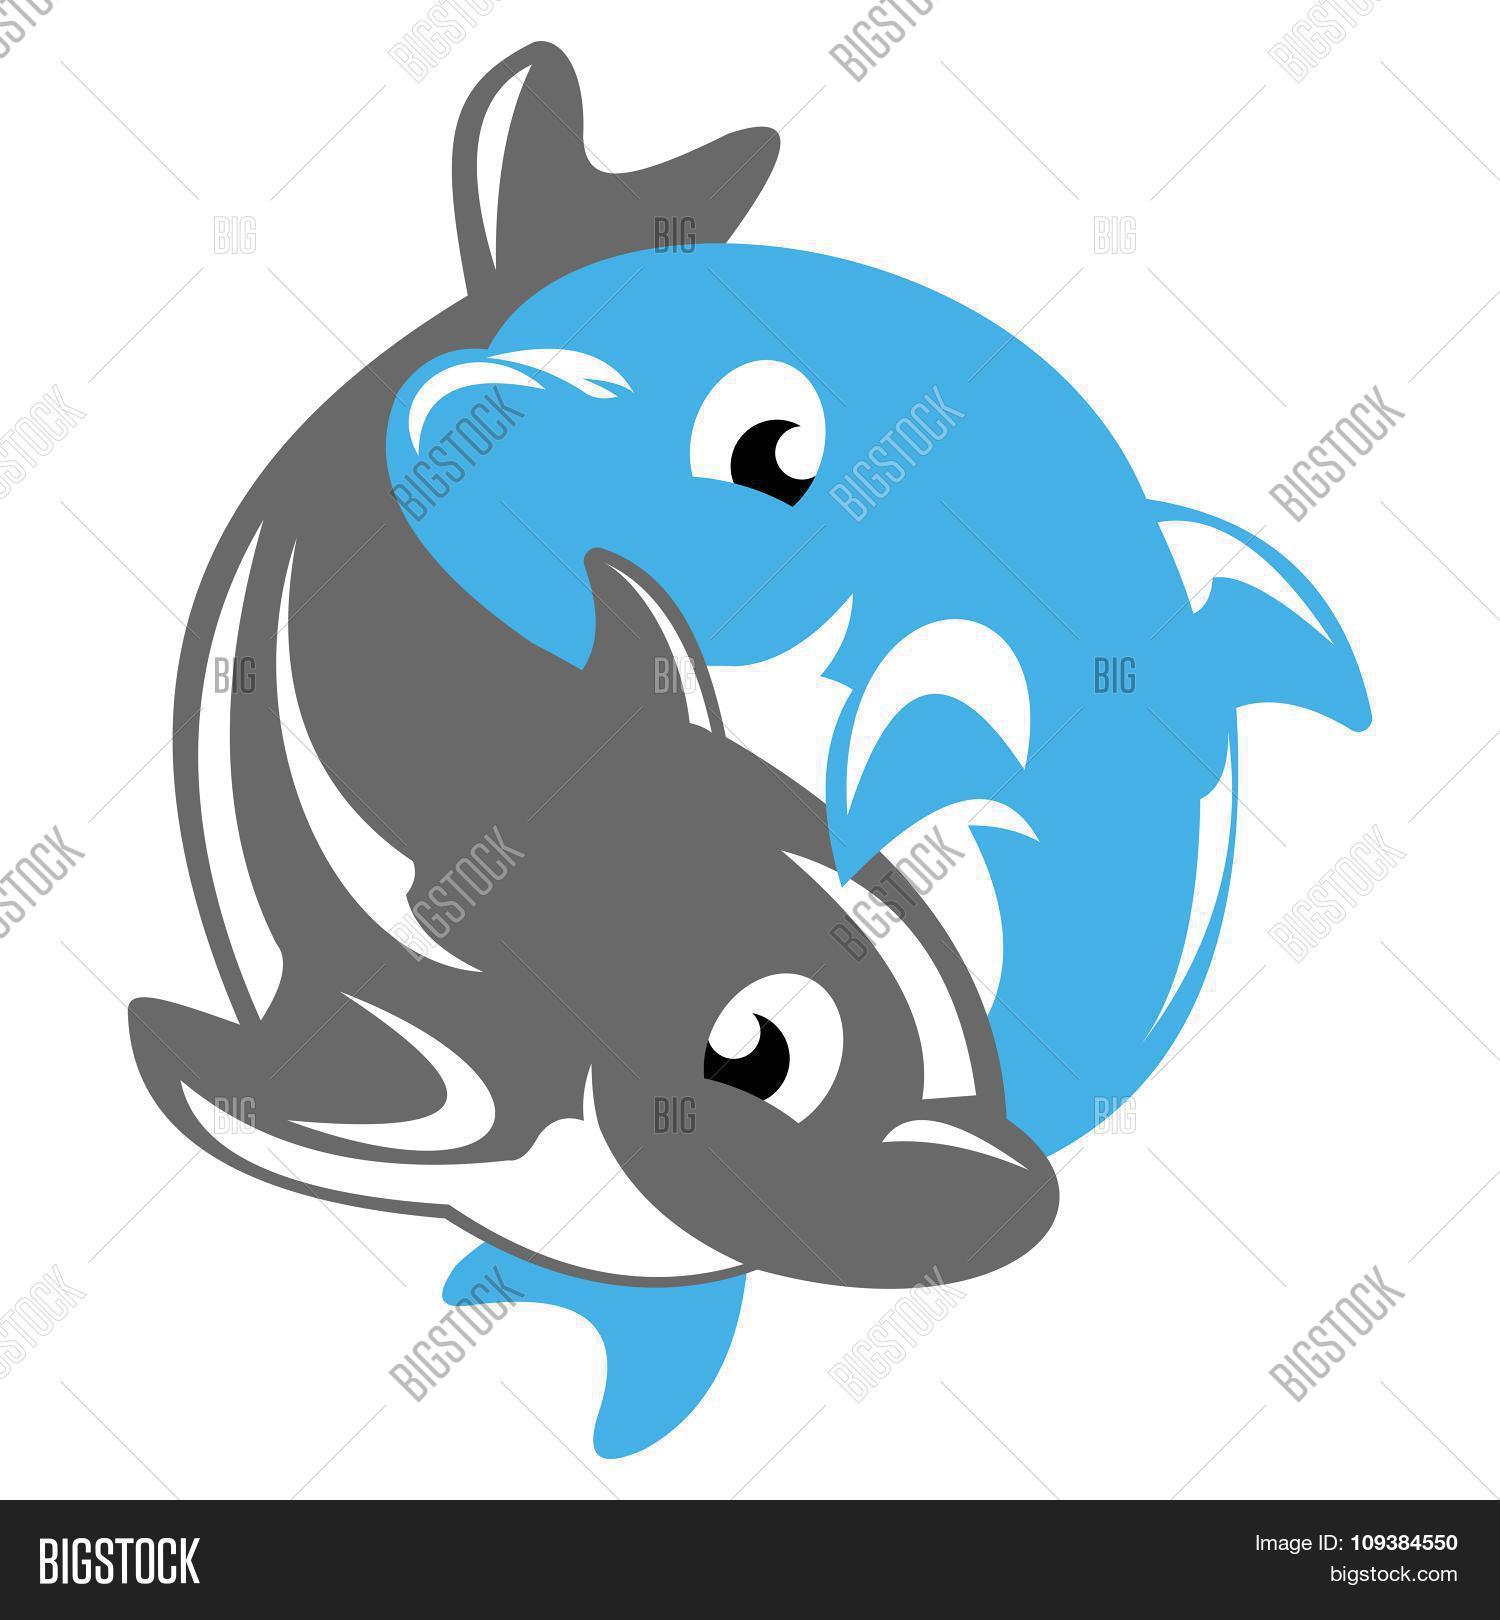 dolphin yin yang vector photo free trial bigstock rh bigstockphoto com Baby Dolphin Yin Yang Silhouette Dolphin Yin Yang Tattoo Designs